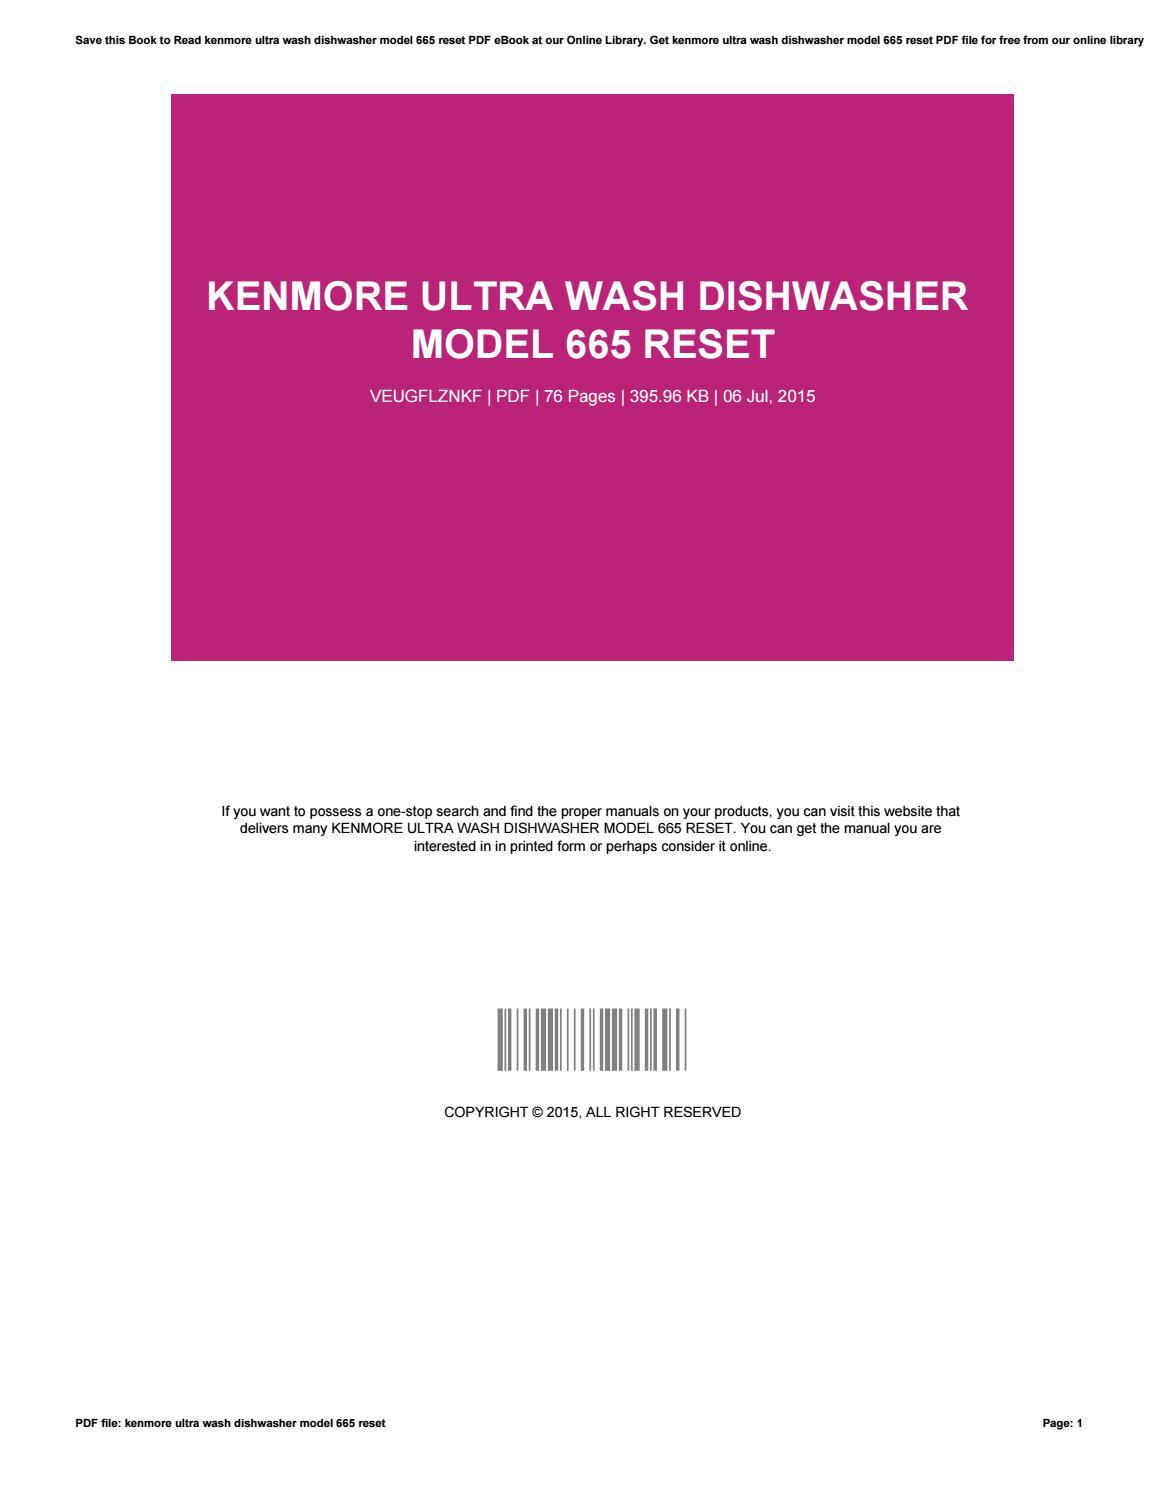 Kenmore ultra wash dishwasher model 665 reset by ... on kenmore 665 dishwasher disassembly schematic, kenmore washer repair manual, kenmore dishwasher silverware basket 8539162, kenmore quiet guard dishwasher parts, kenmore dishwasher model 665 schematic, kenmore dishwasher parts schematic, kenmore ultra dishwasher parts,